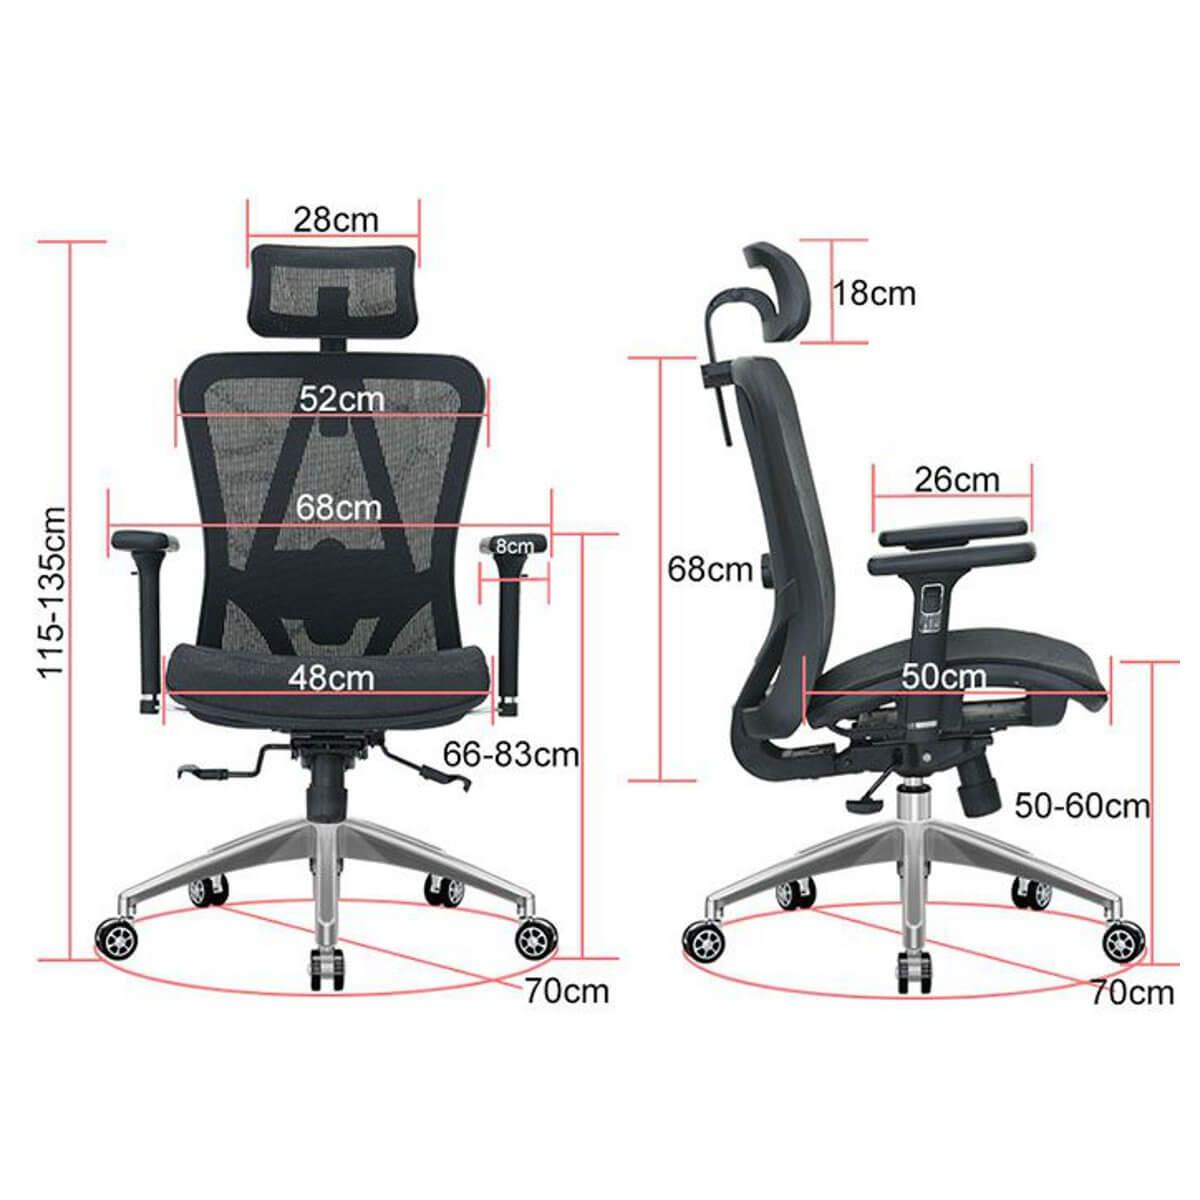 Ficha técnica silla ergonómica chile